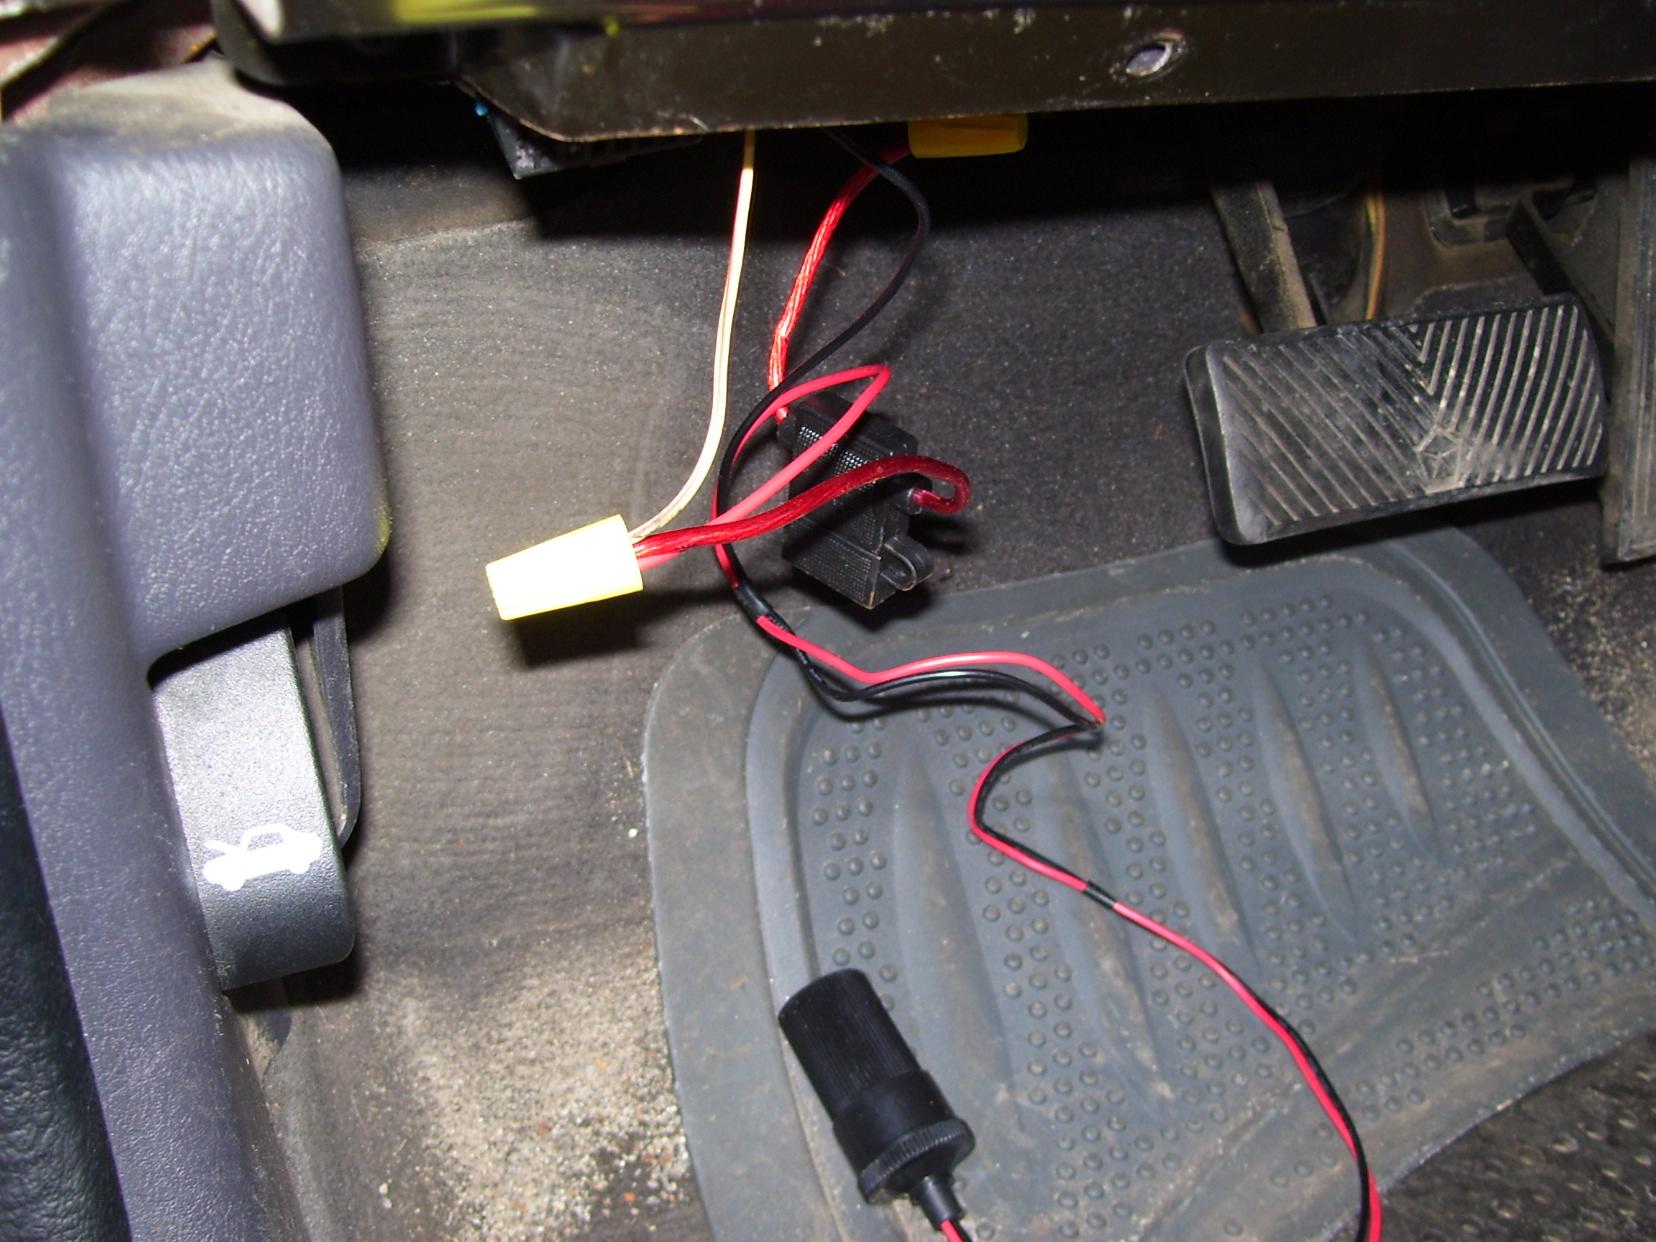 Adding a Second Car Power Jack : 7 Steps - Instructables [ 1242 x 1656 Pixel ]